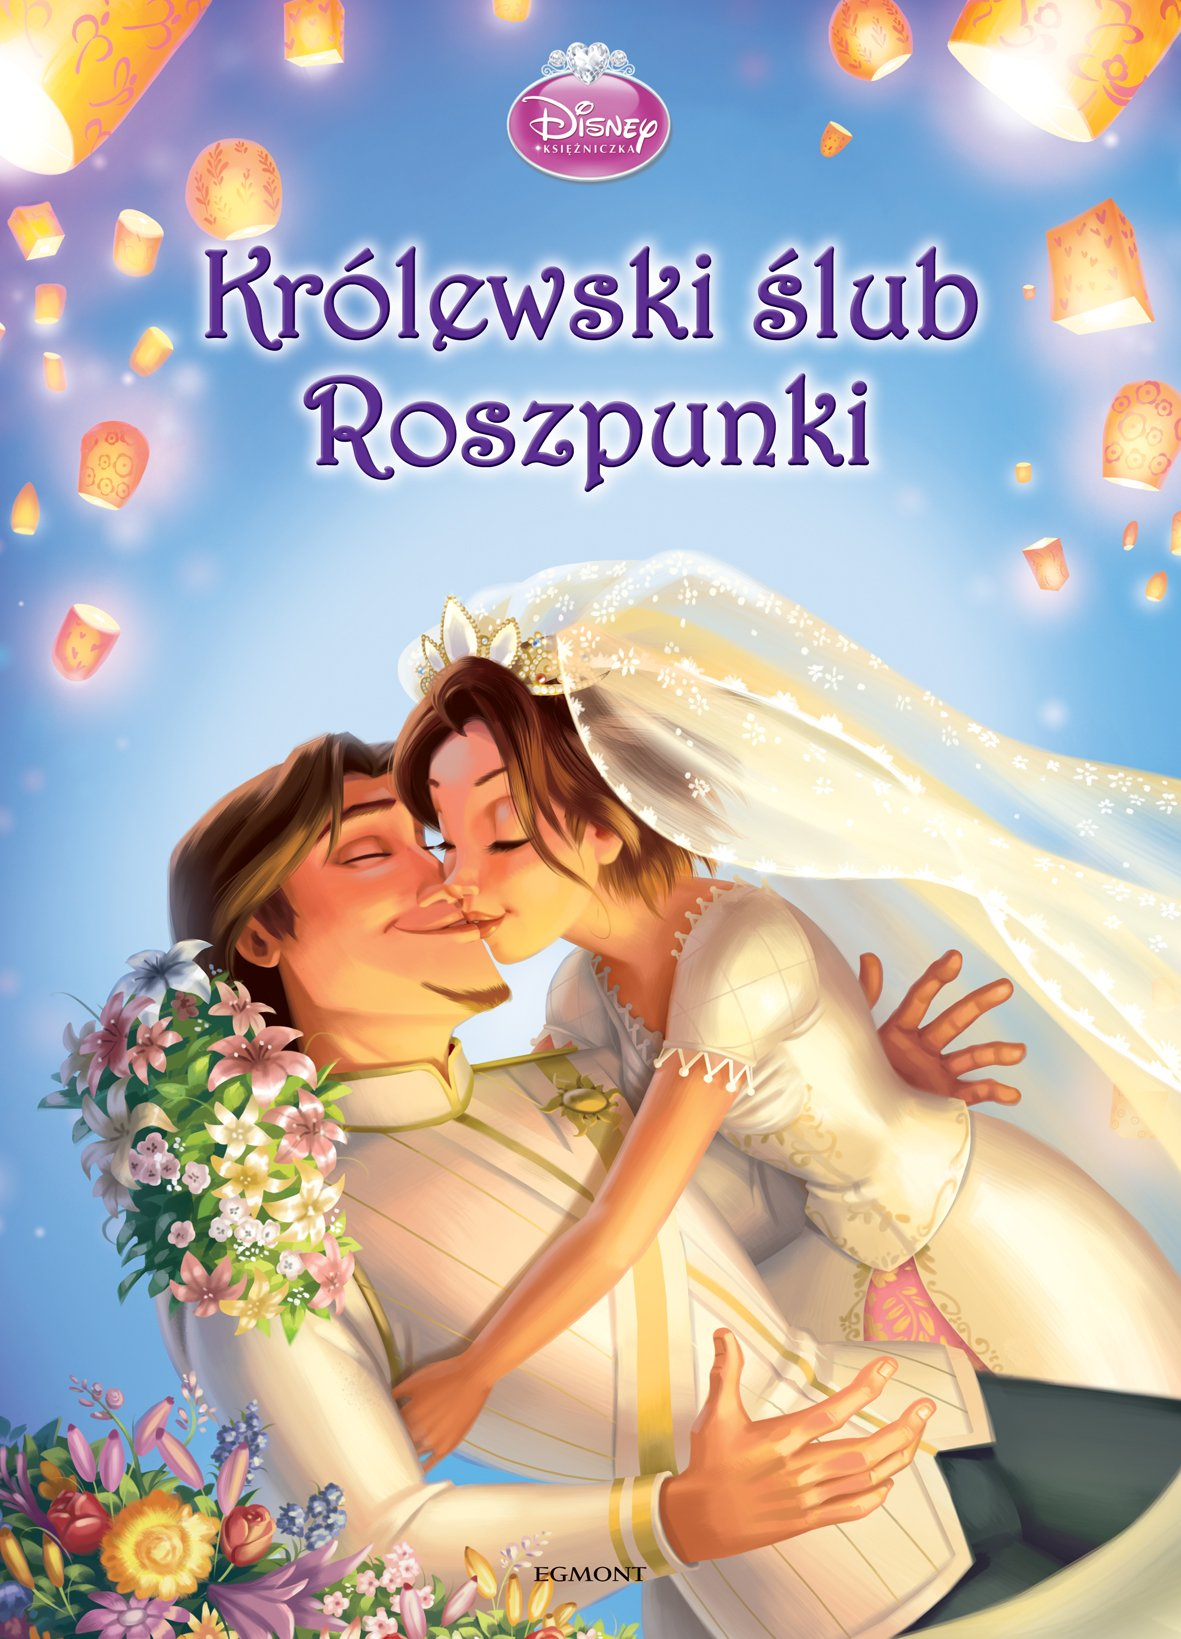 Disney Ksiezniczka Krolewski Slub Roszpunki Amazoncouk